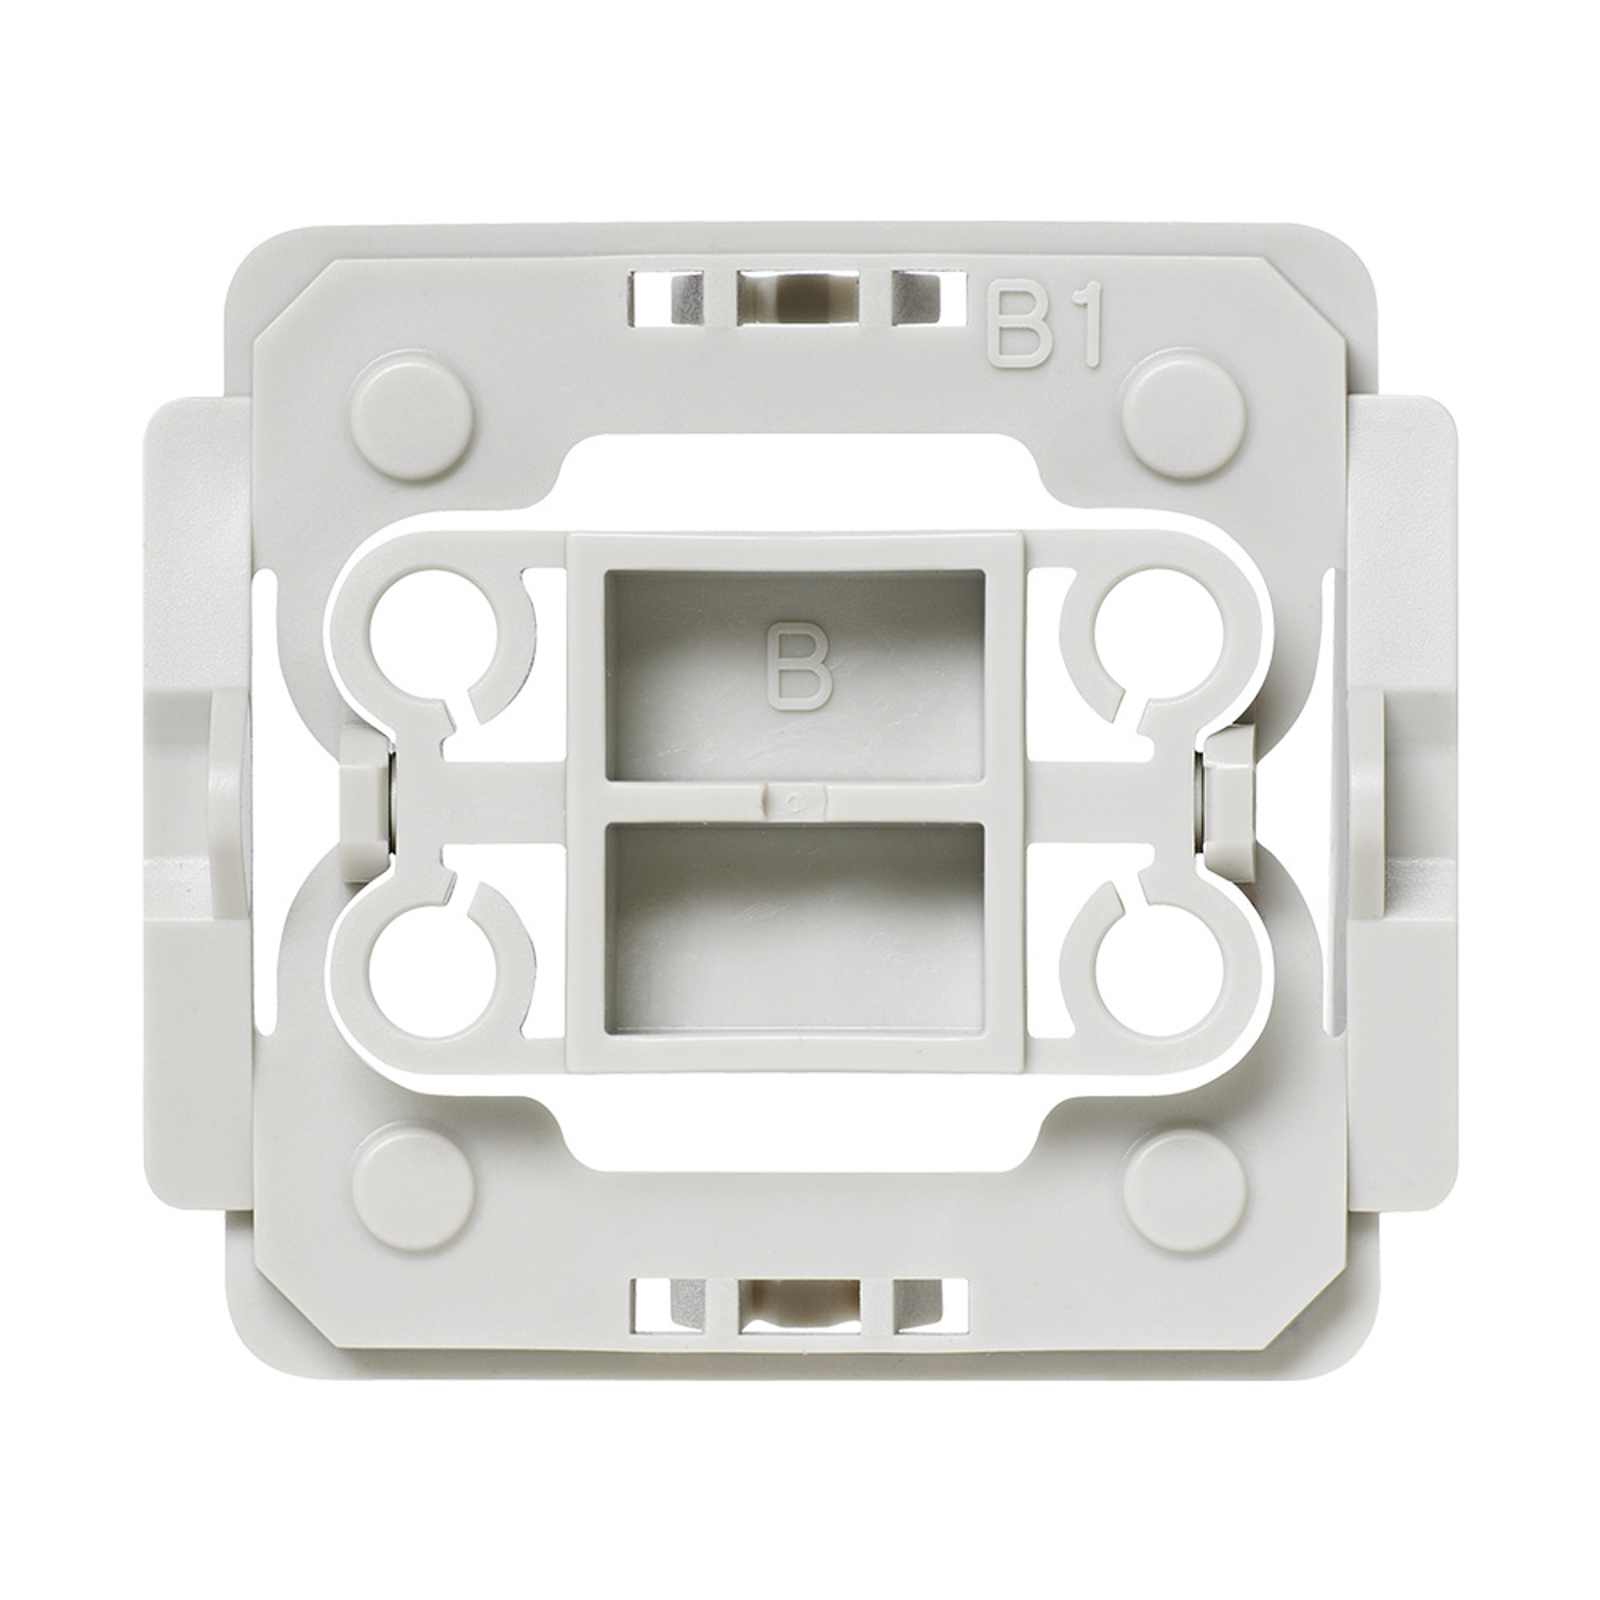 Homematic IP Adapter für Berker Schalter B1 1x